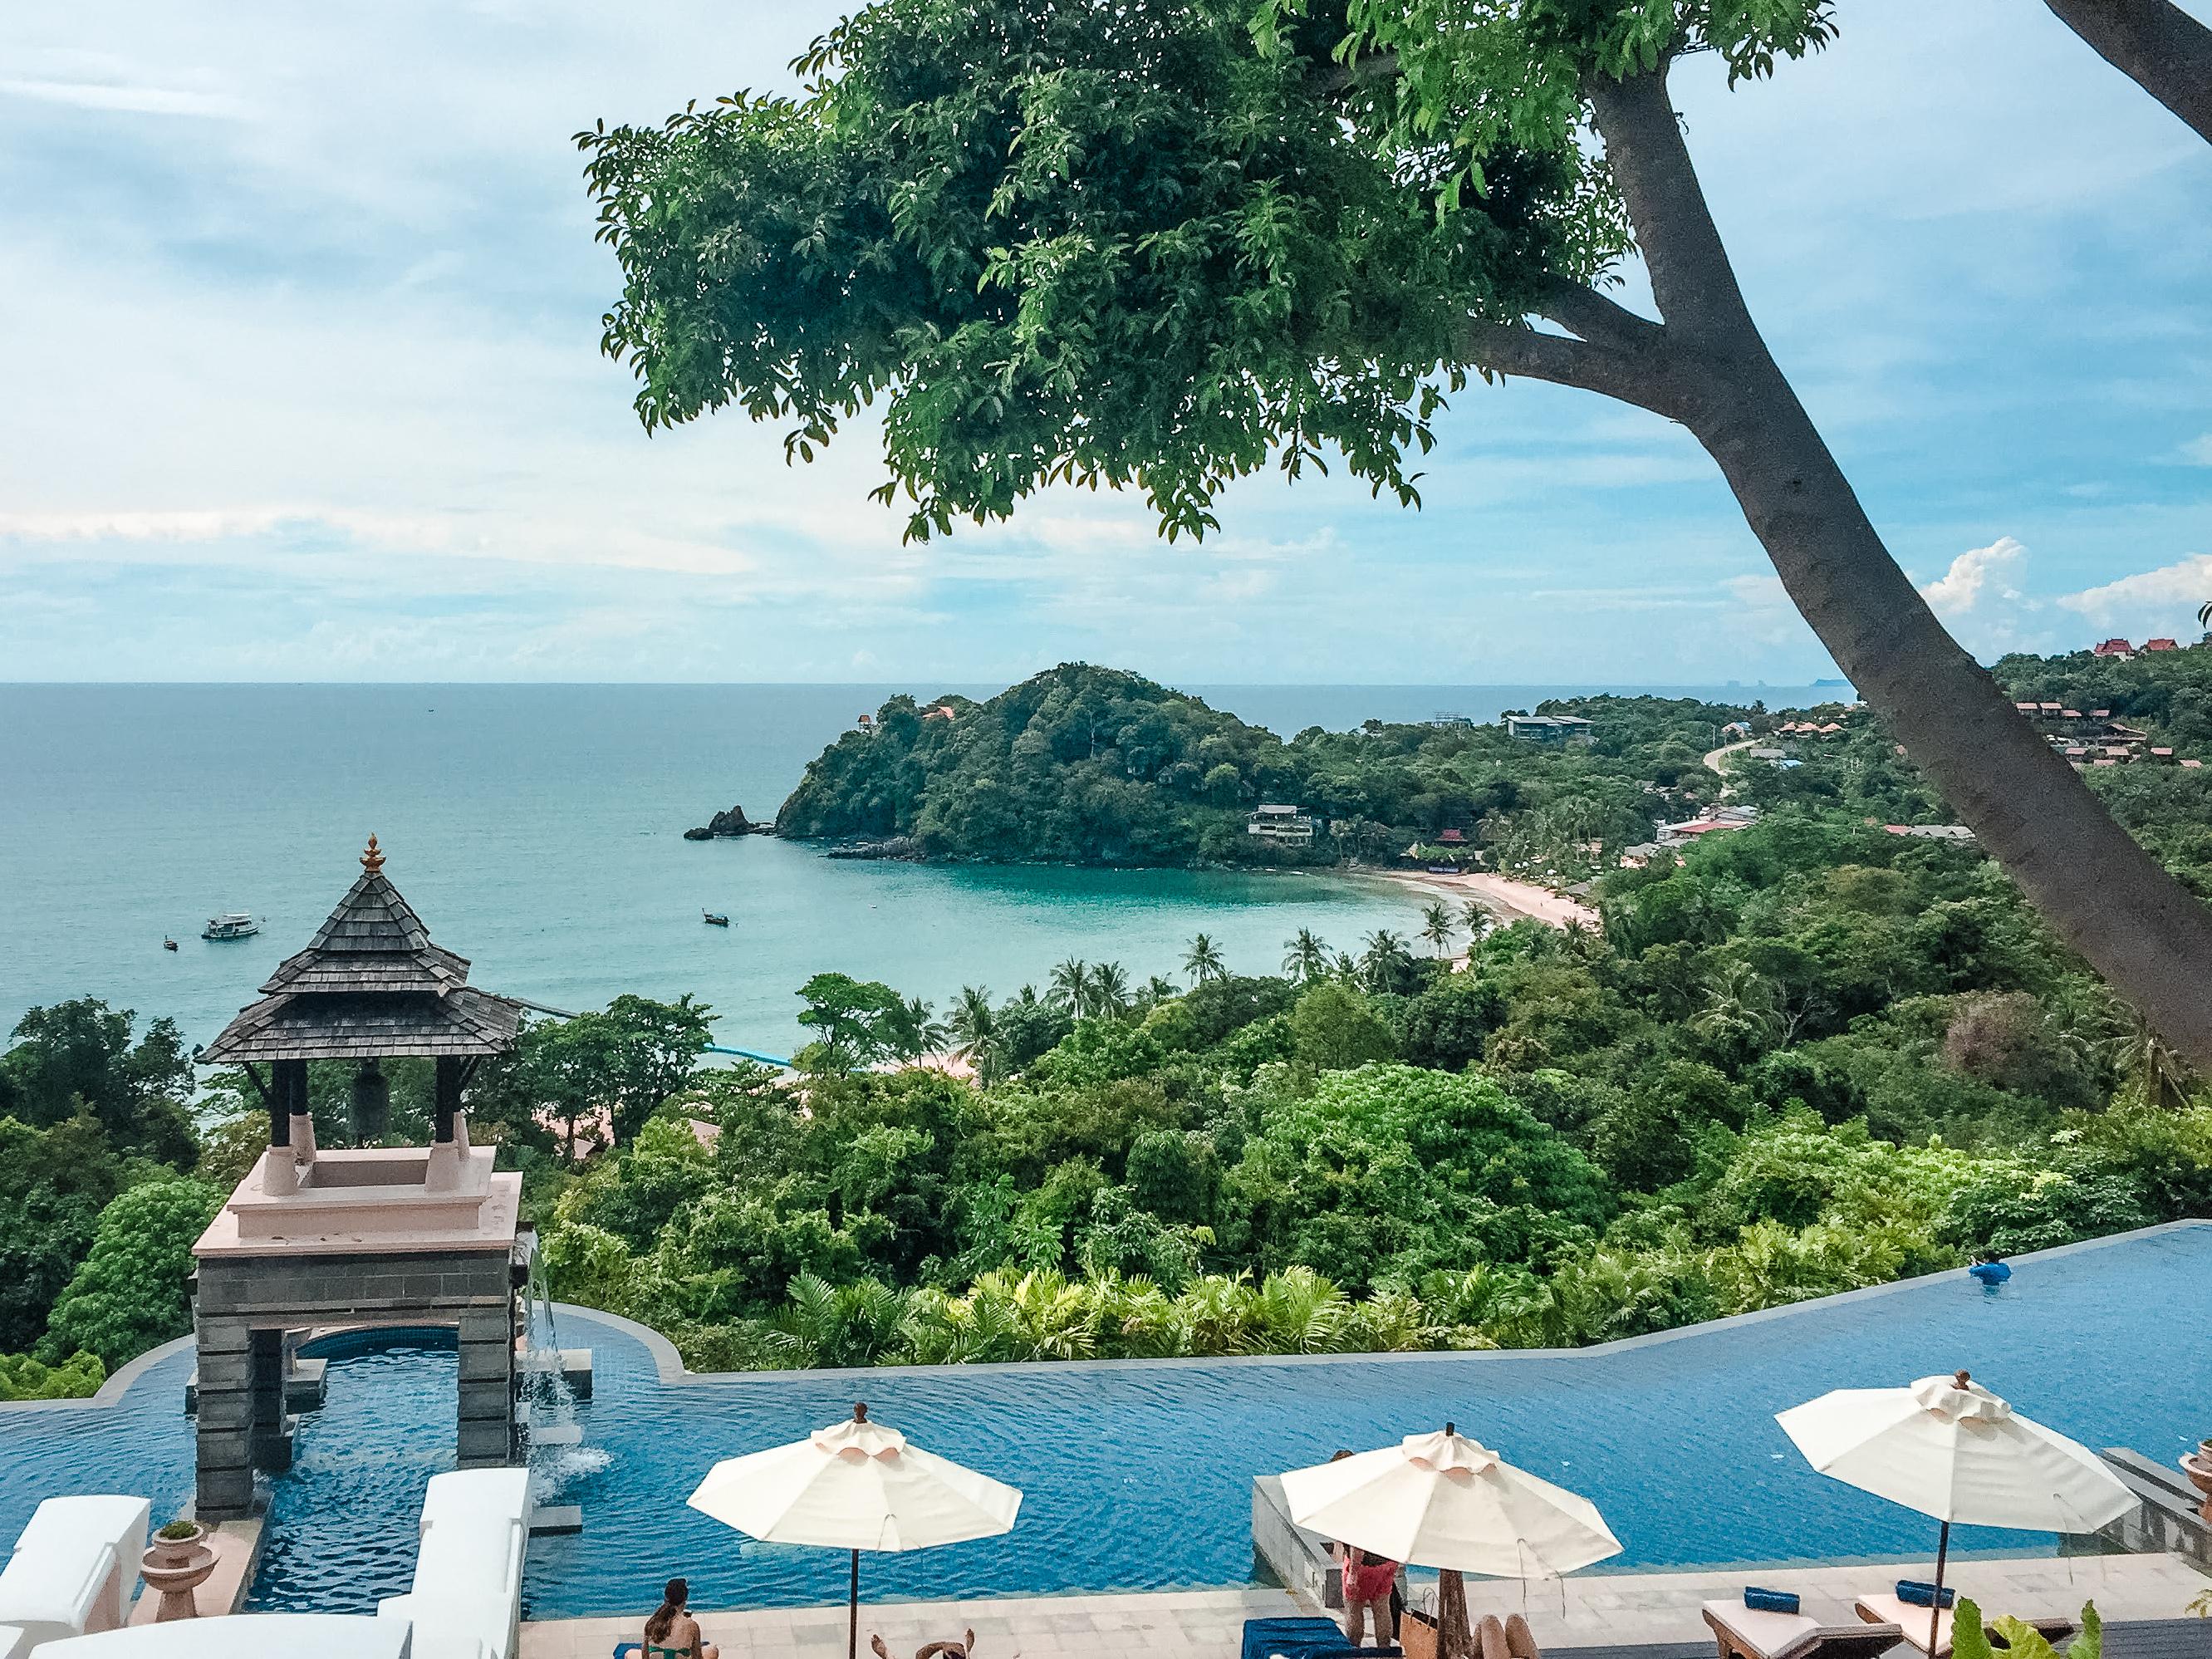 Pimalai Resort and Spa pool overlooking trees and ocean in Ko Lanta Thailand